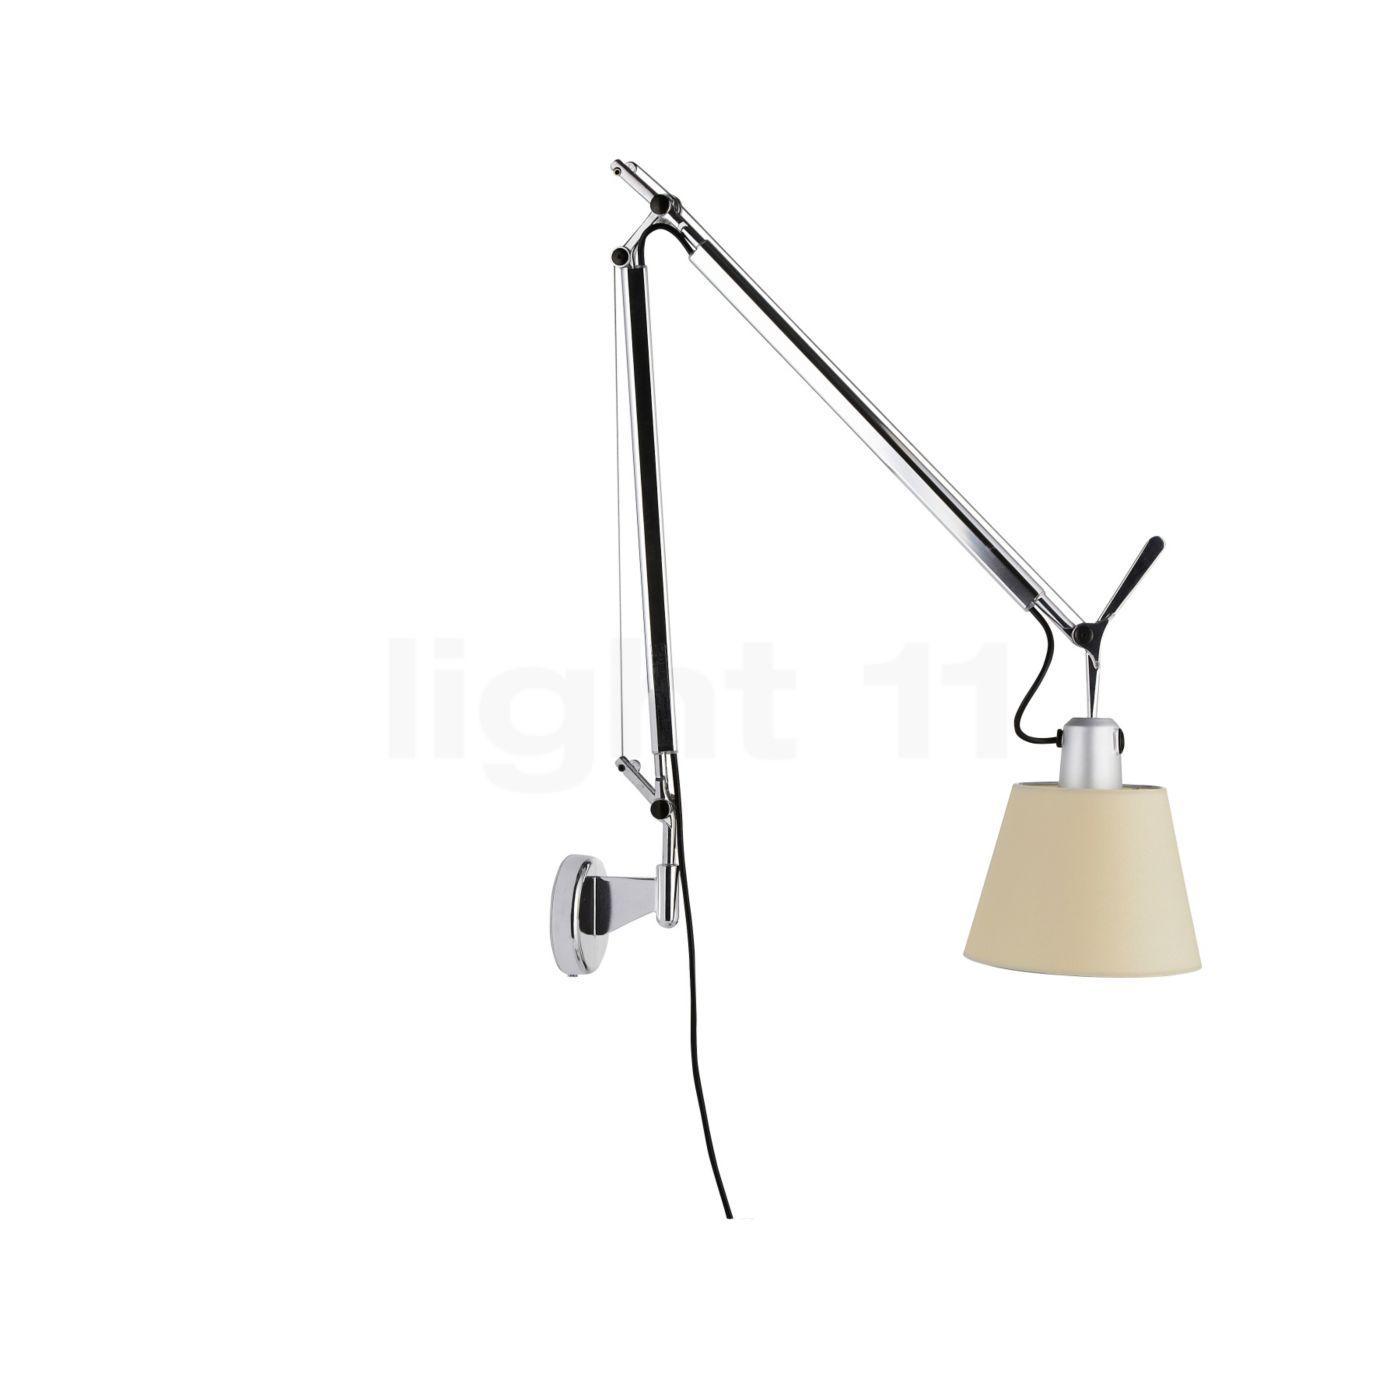 Artemide Tolomeo Basculante Parete Workplace Lamps